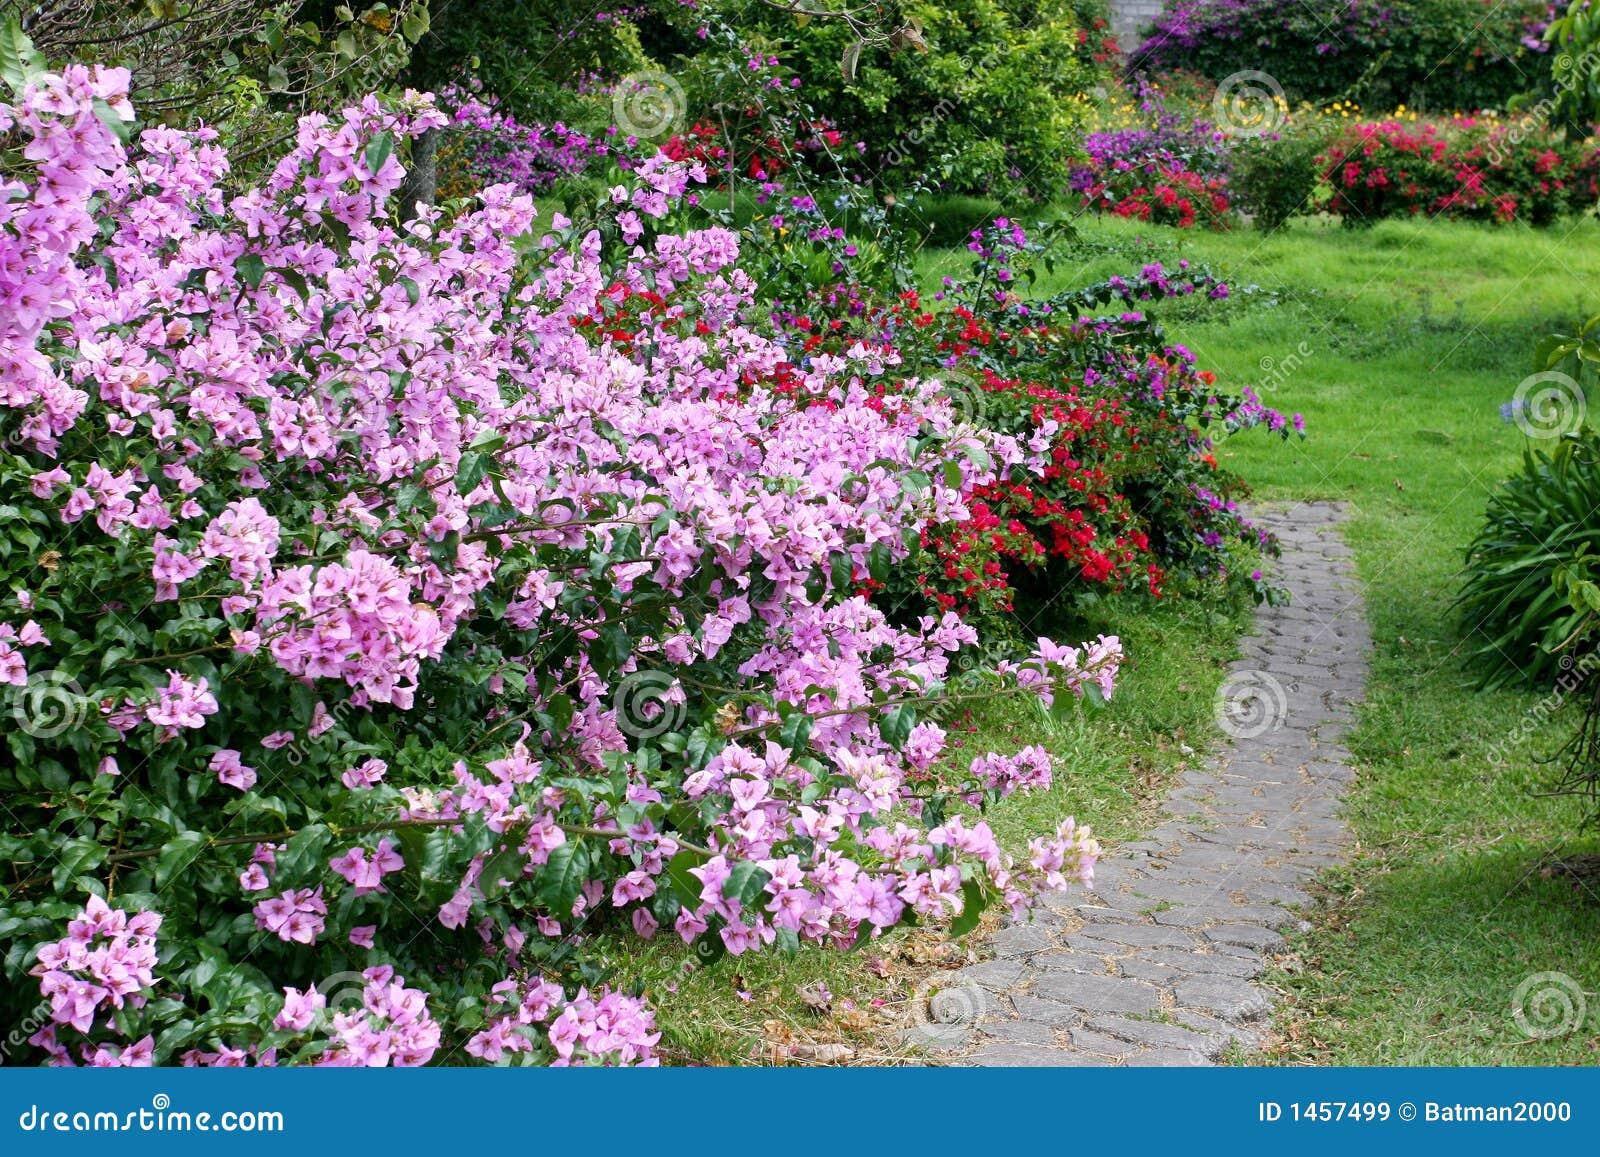 fotos jardim horizontal : fotos jardim horizontal:Spring Flowers Horizontal Road